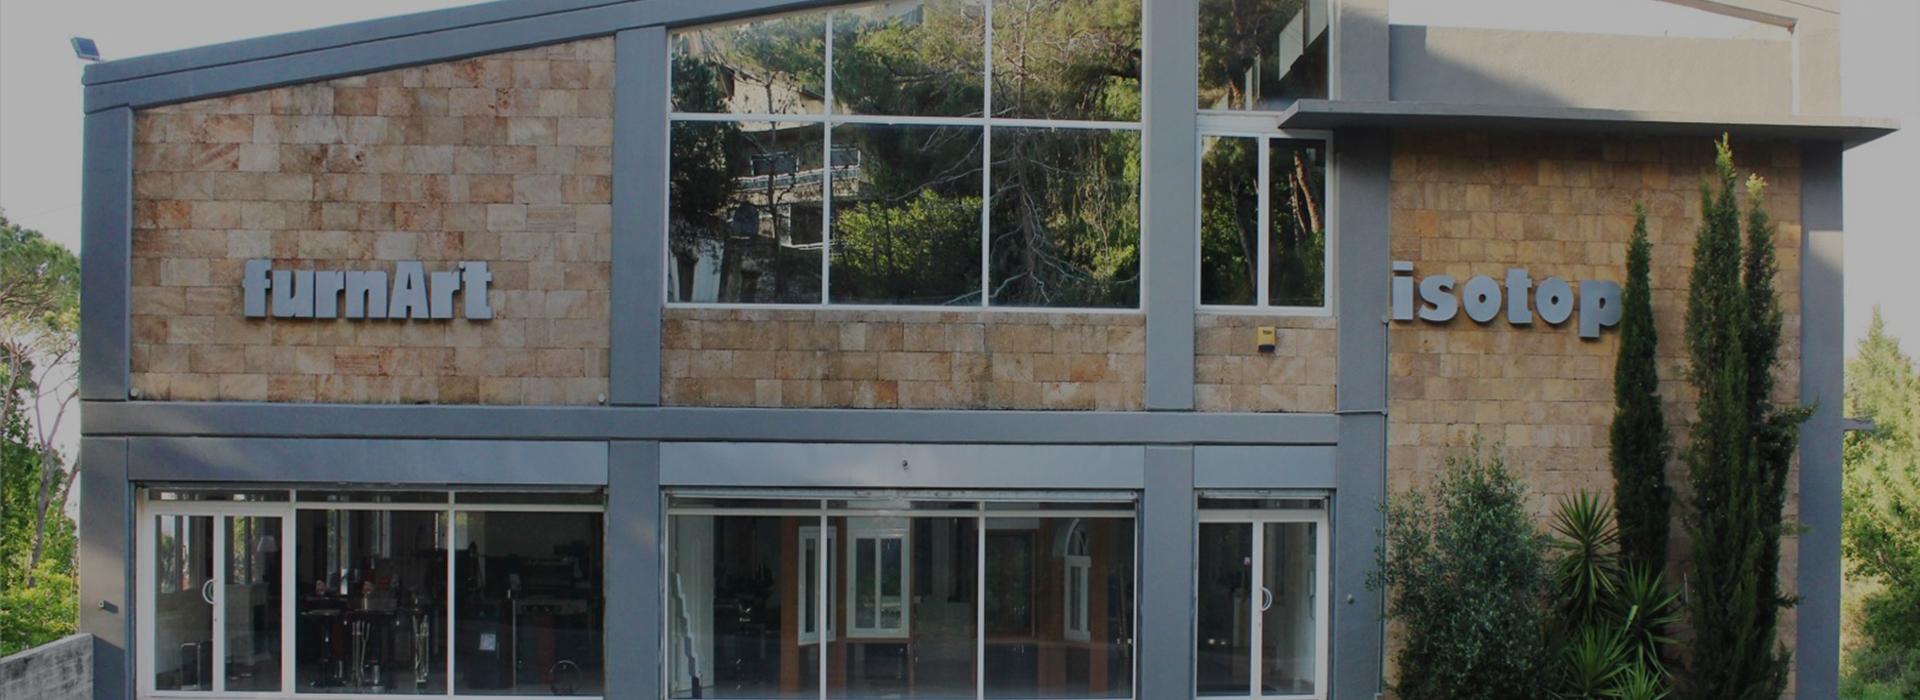 Isotop | PVC Windows and Doors in Lebanon | UPVC in Lebanon, Windows